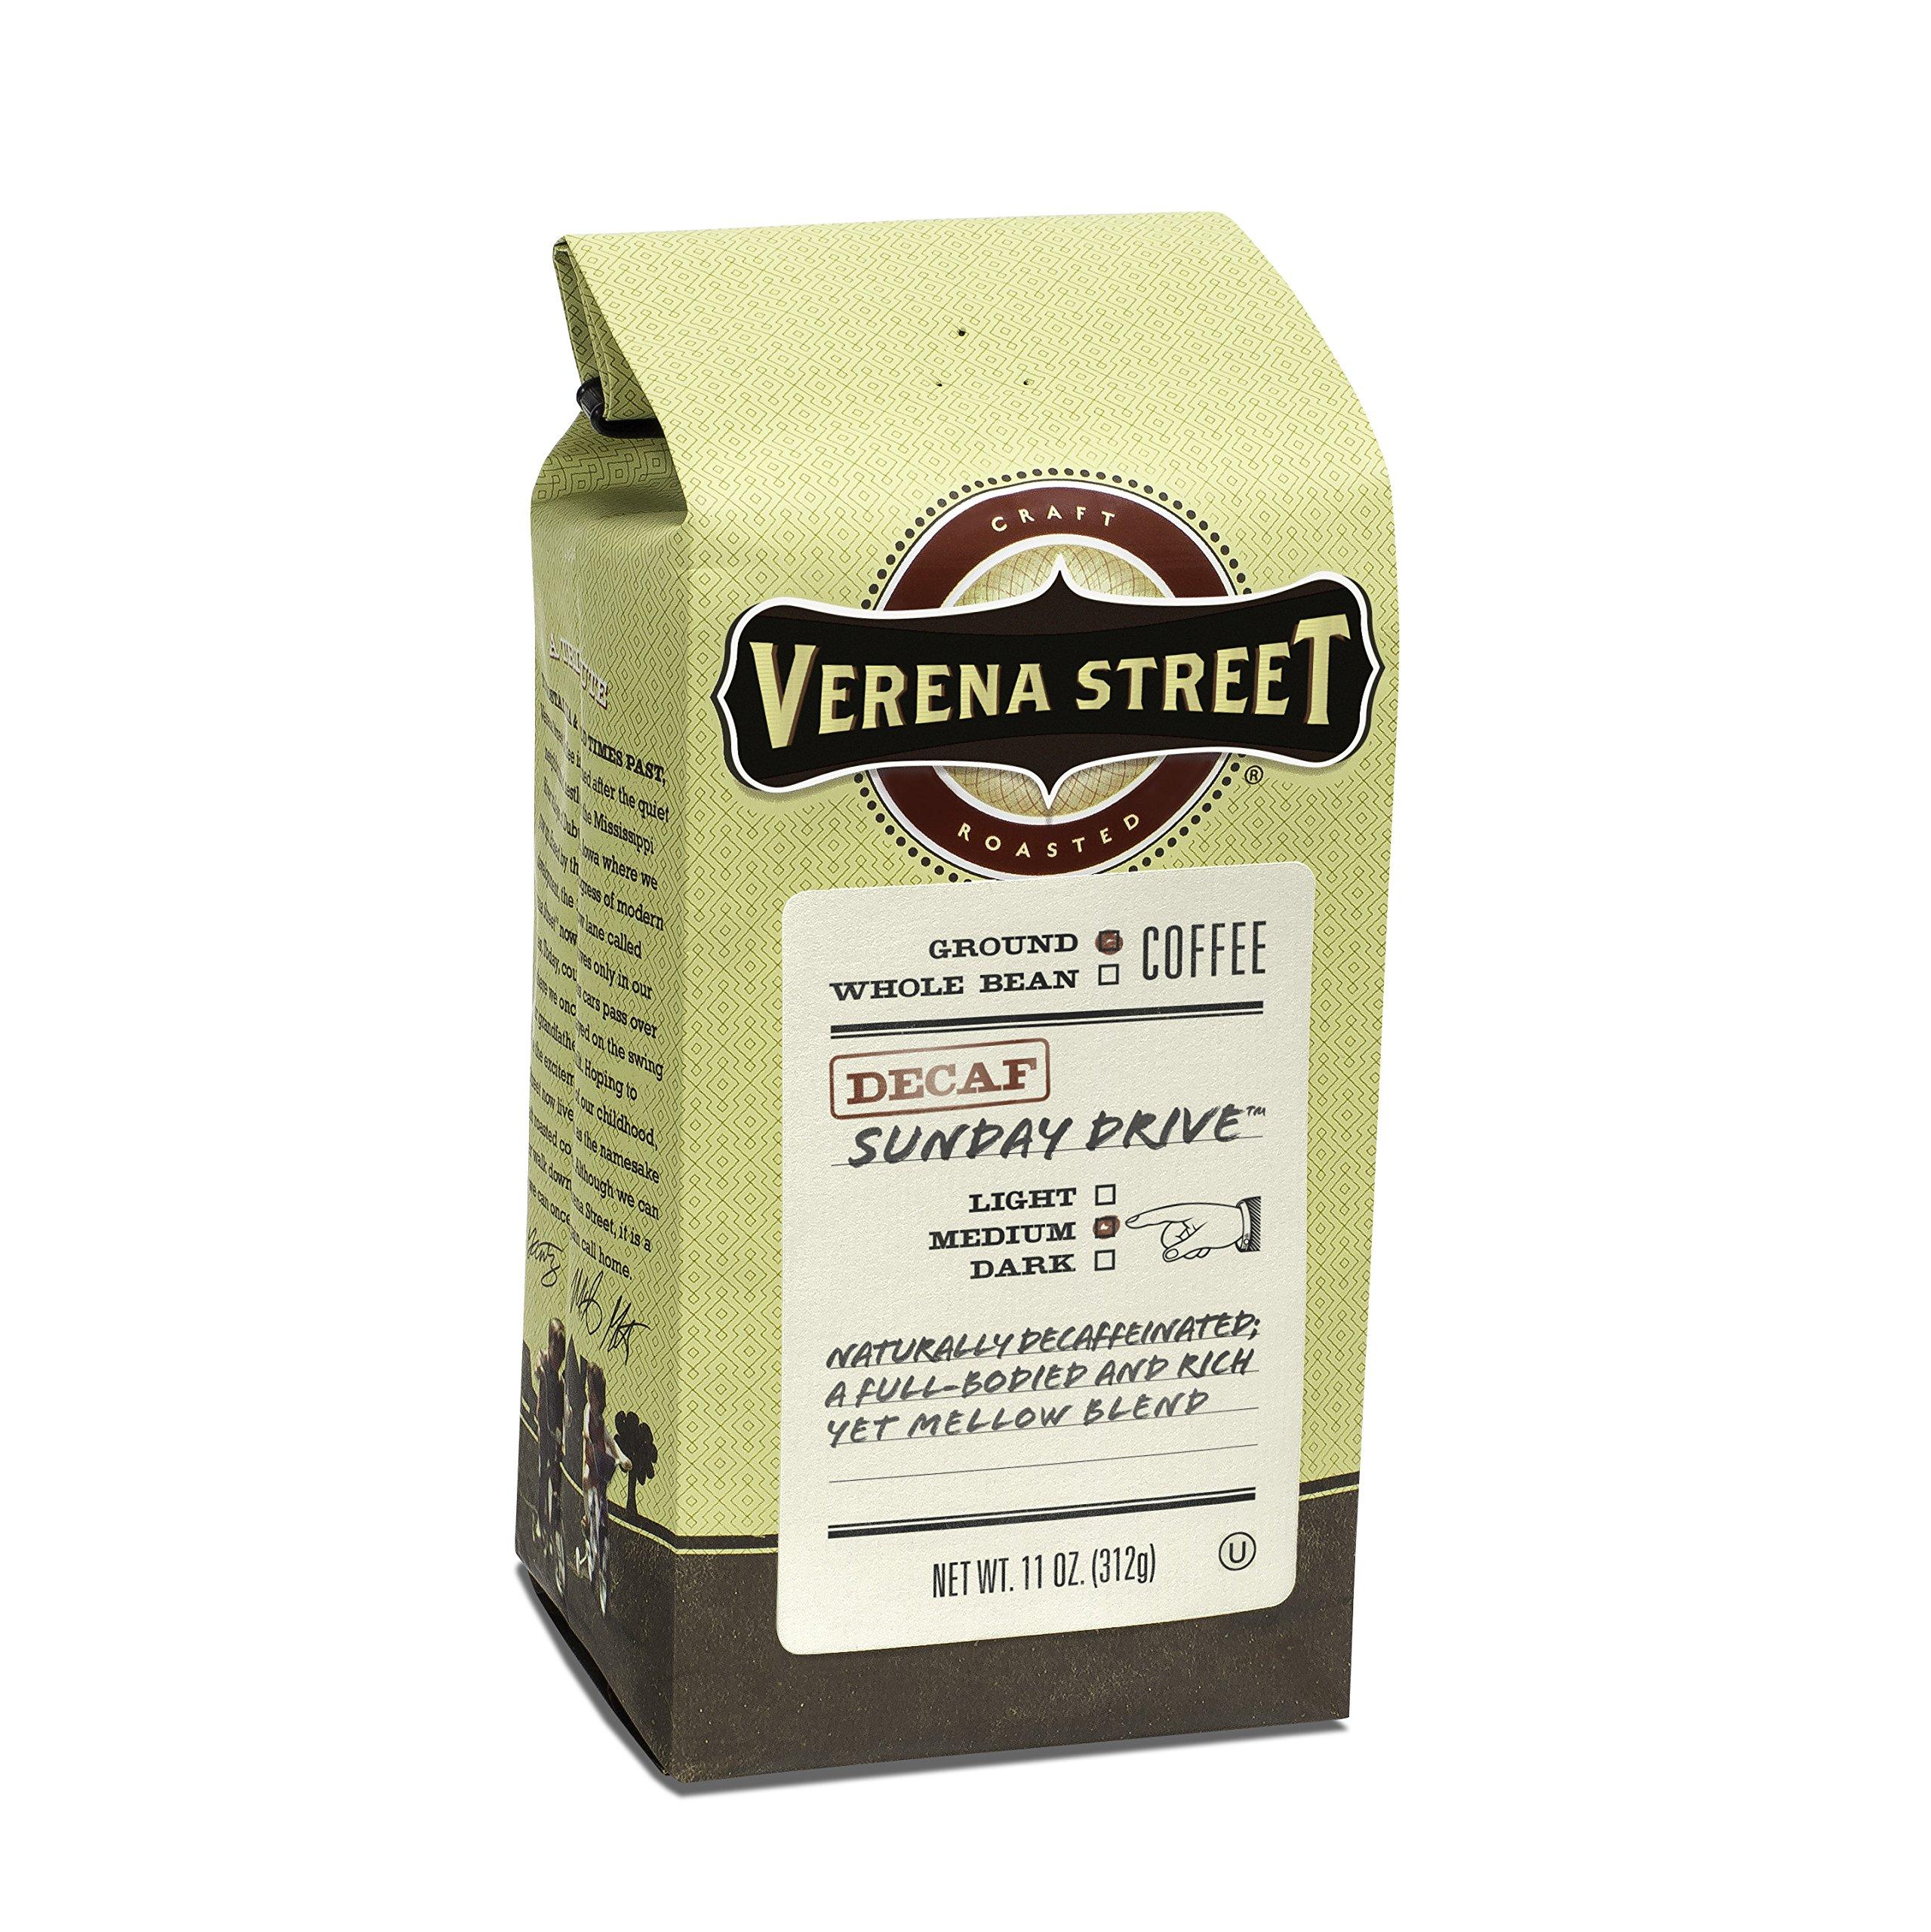 Verena Street 11 Ounce Ground, Swiss Water Process Decaf Coffee, Sunday Drive Decaffeinated, Medium Roast Rainforest Alliance Certified Arabica Coffee